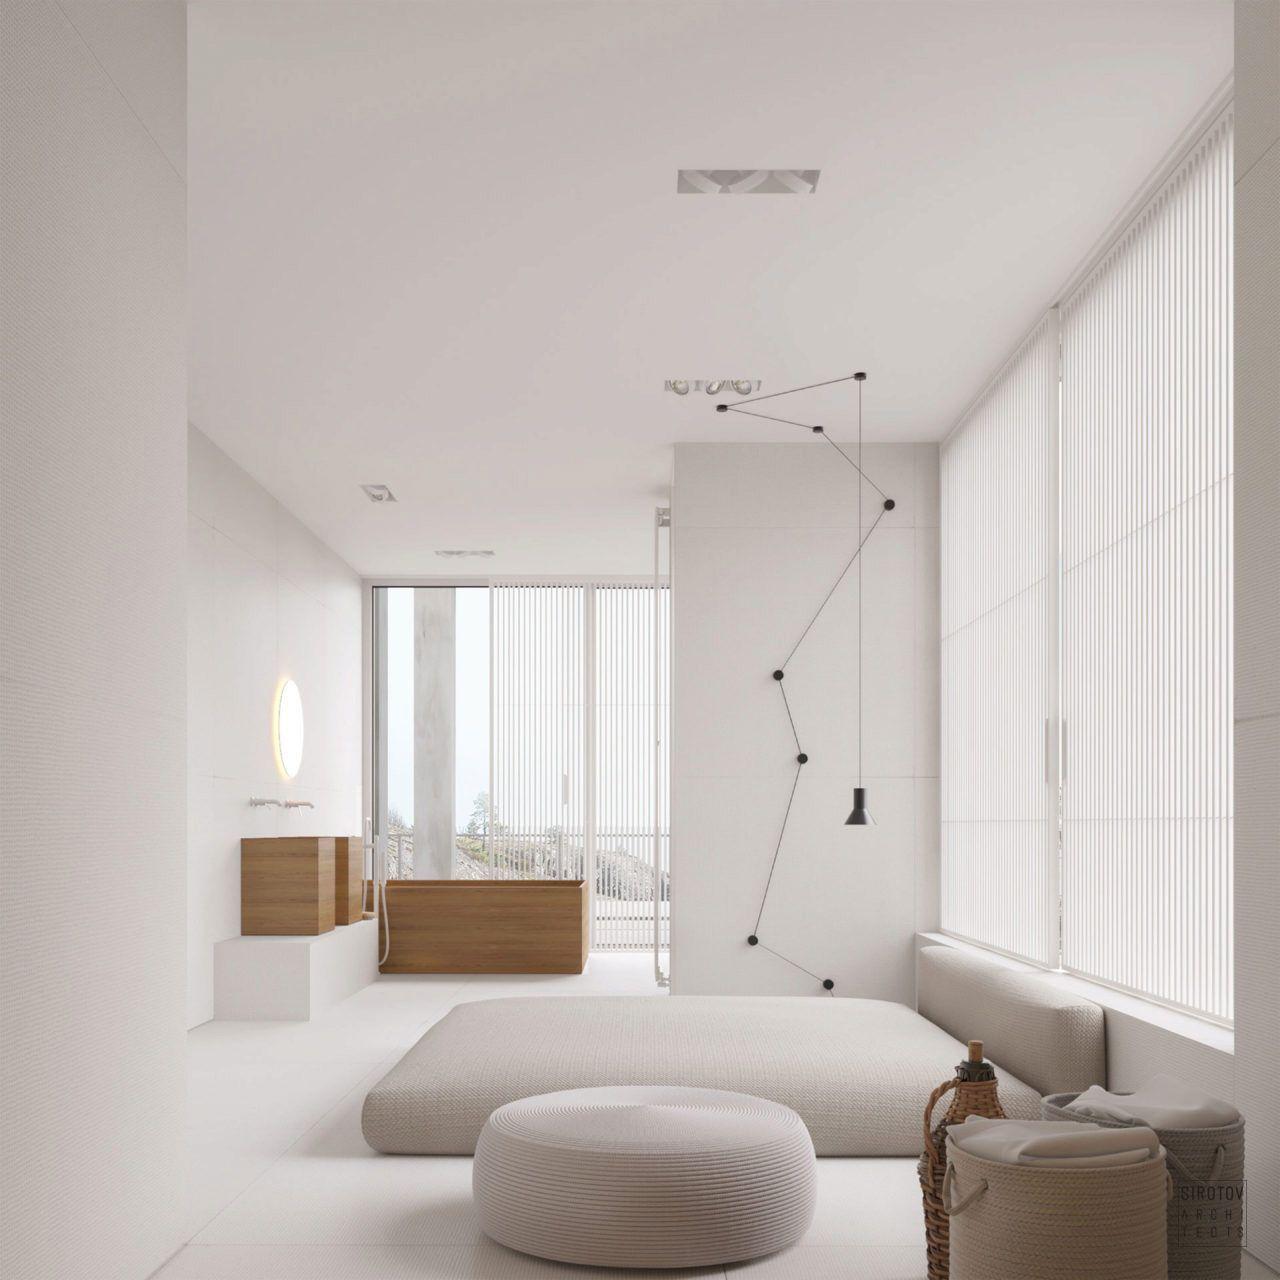 prodigious cool tips minimalist home furniture interior design photography also best ideas bedroom neutral linens rh pinterest